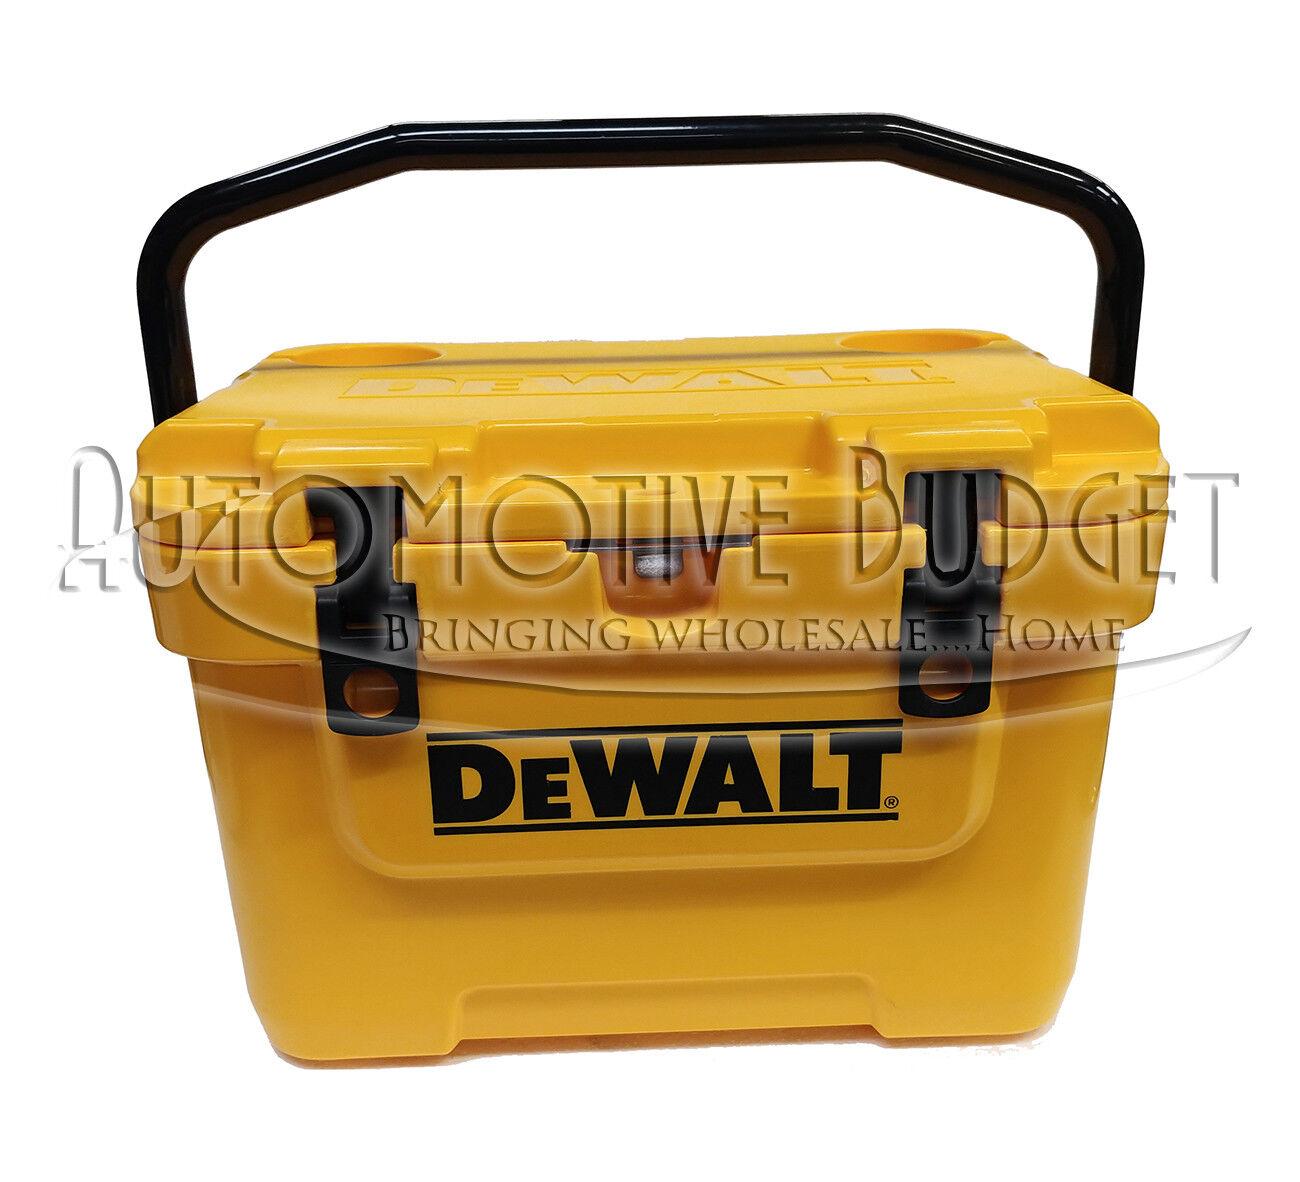 DeWalt Heavy Duty Cooler   Jobsite Lunchbox - 10QT capacity - NEW